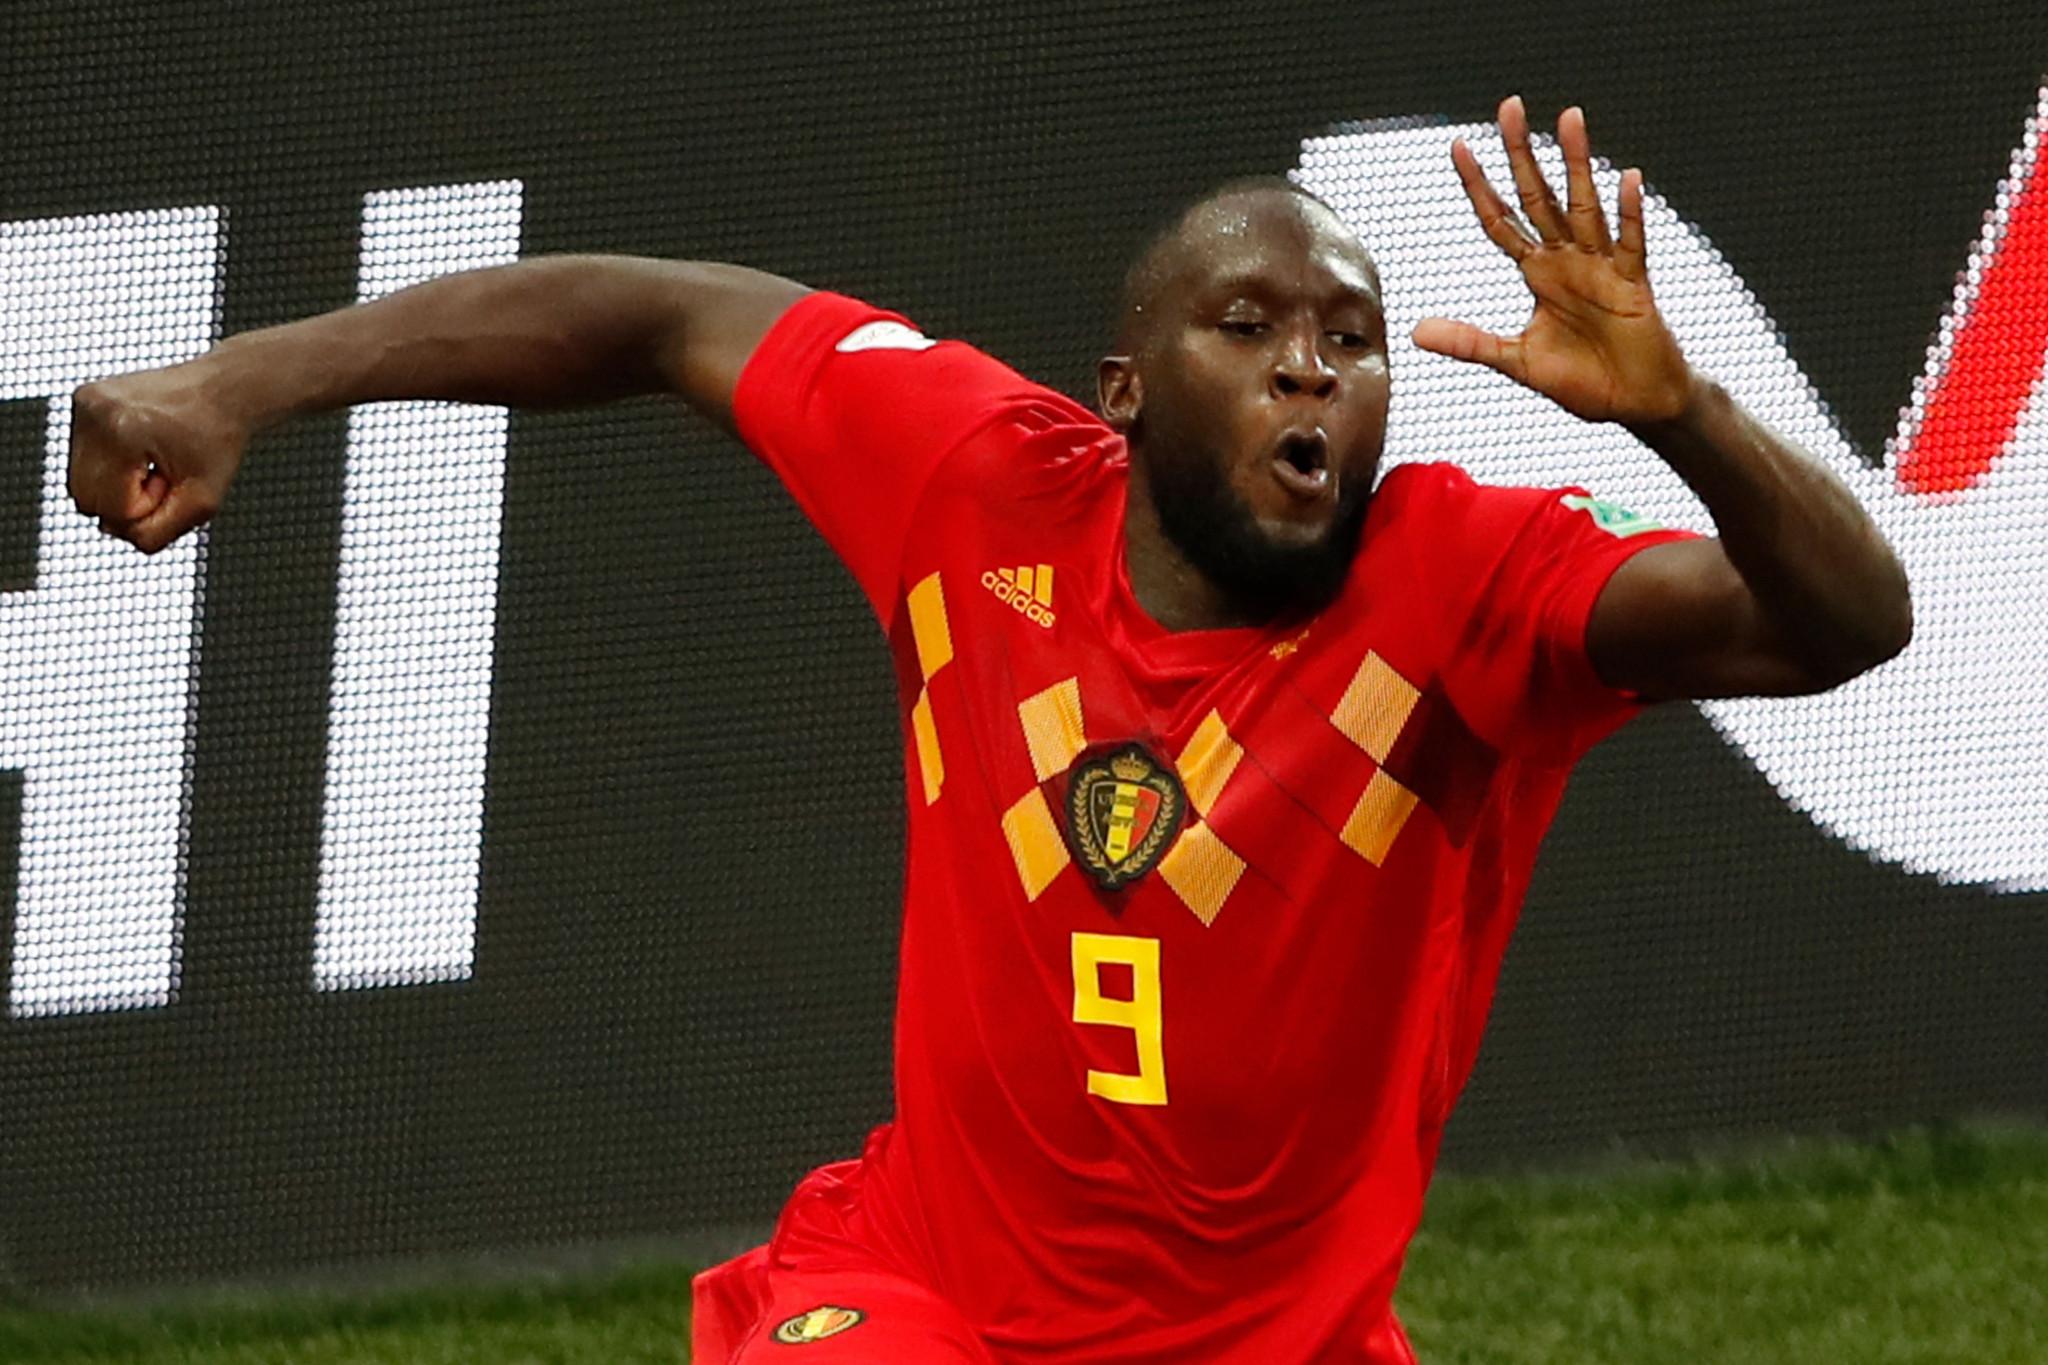 Romelu Lukaku found the net twice for Belgium ©Getty Images